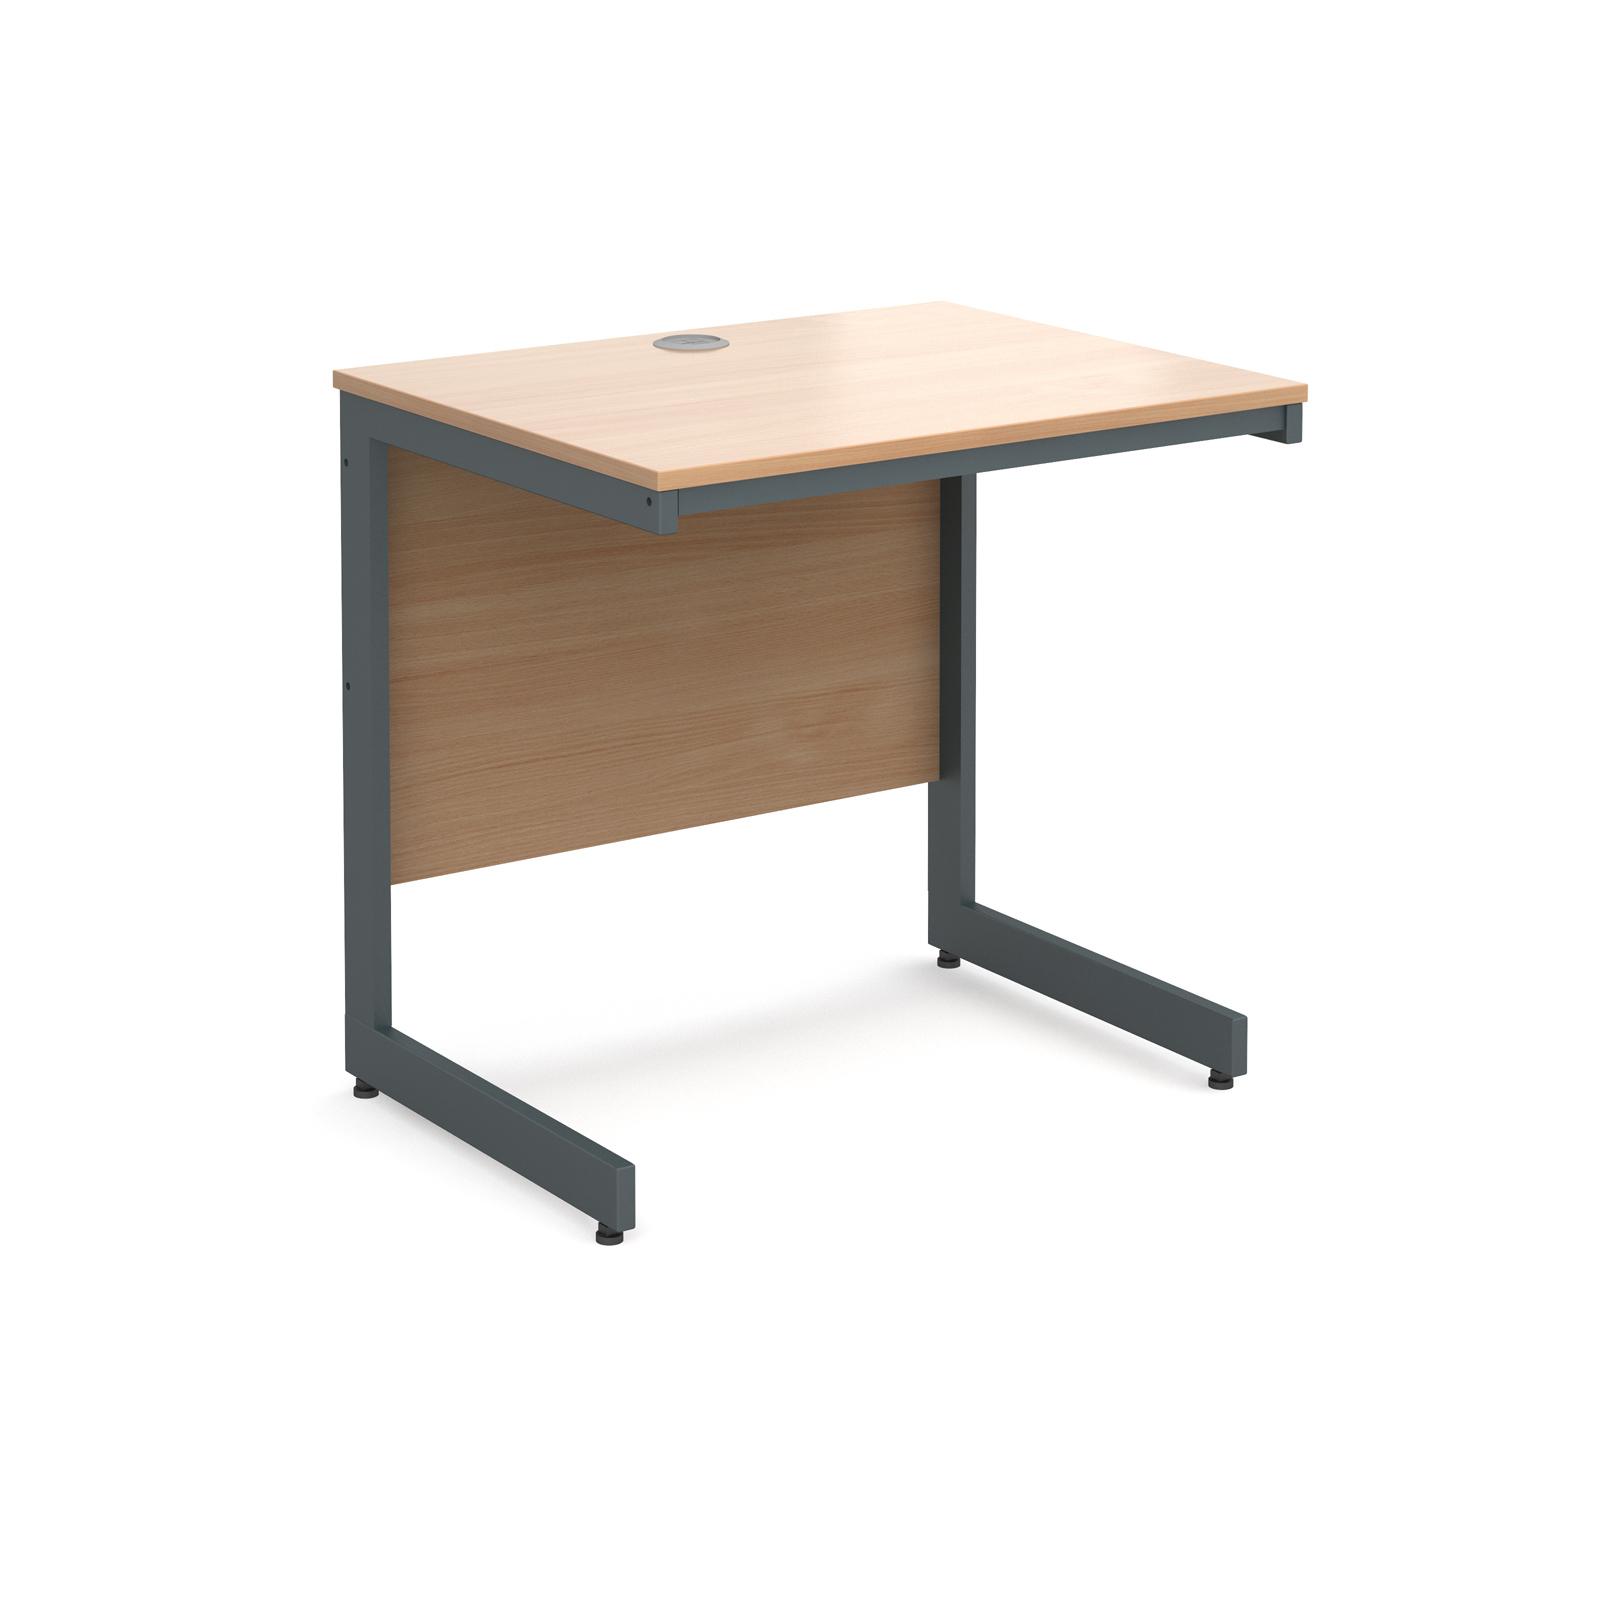 Standing Desk Extension Desk Workstation Accessories Kenroy Thompson Ltd